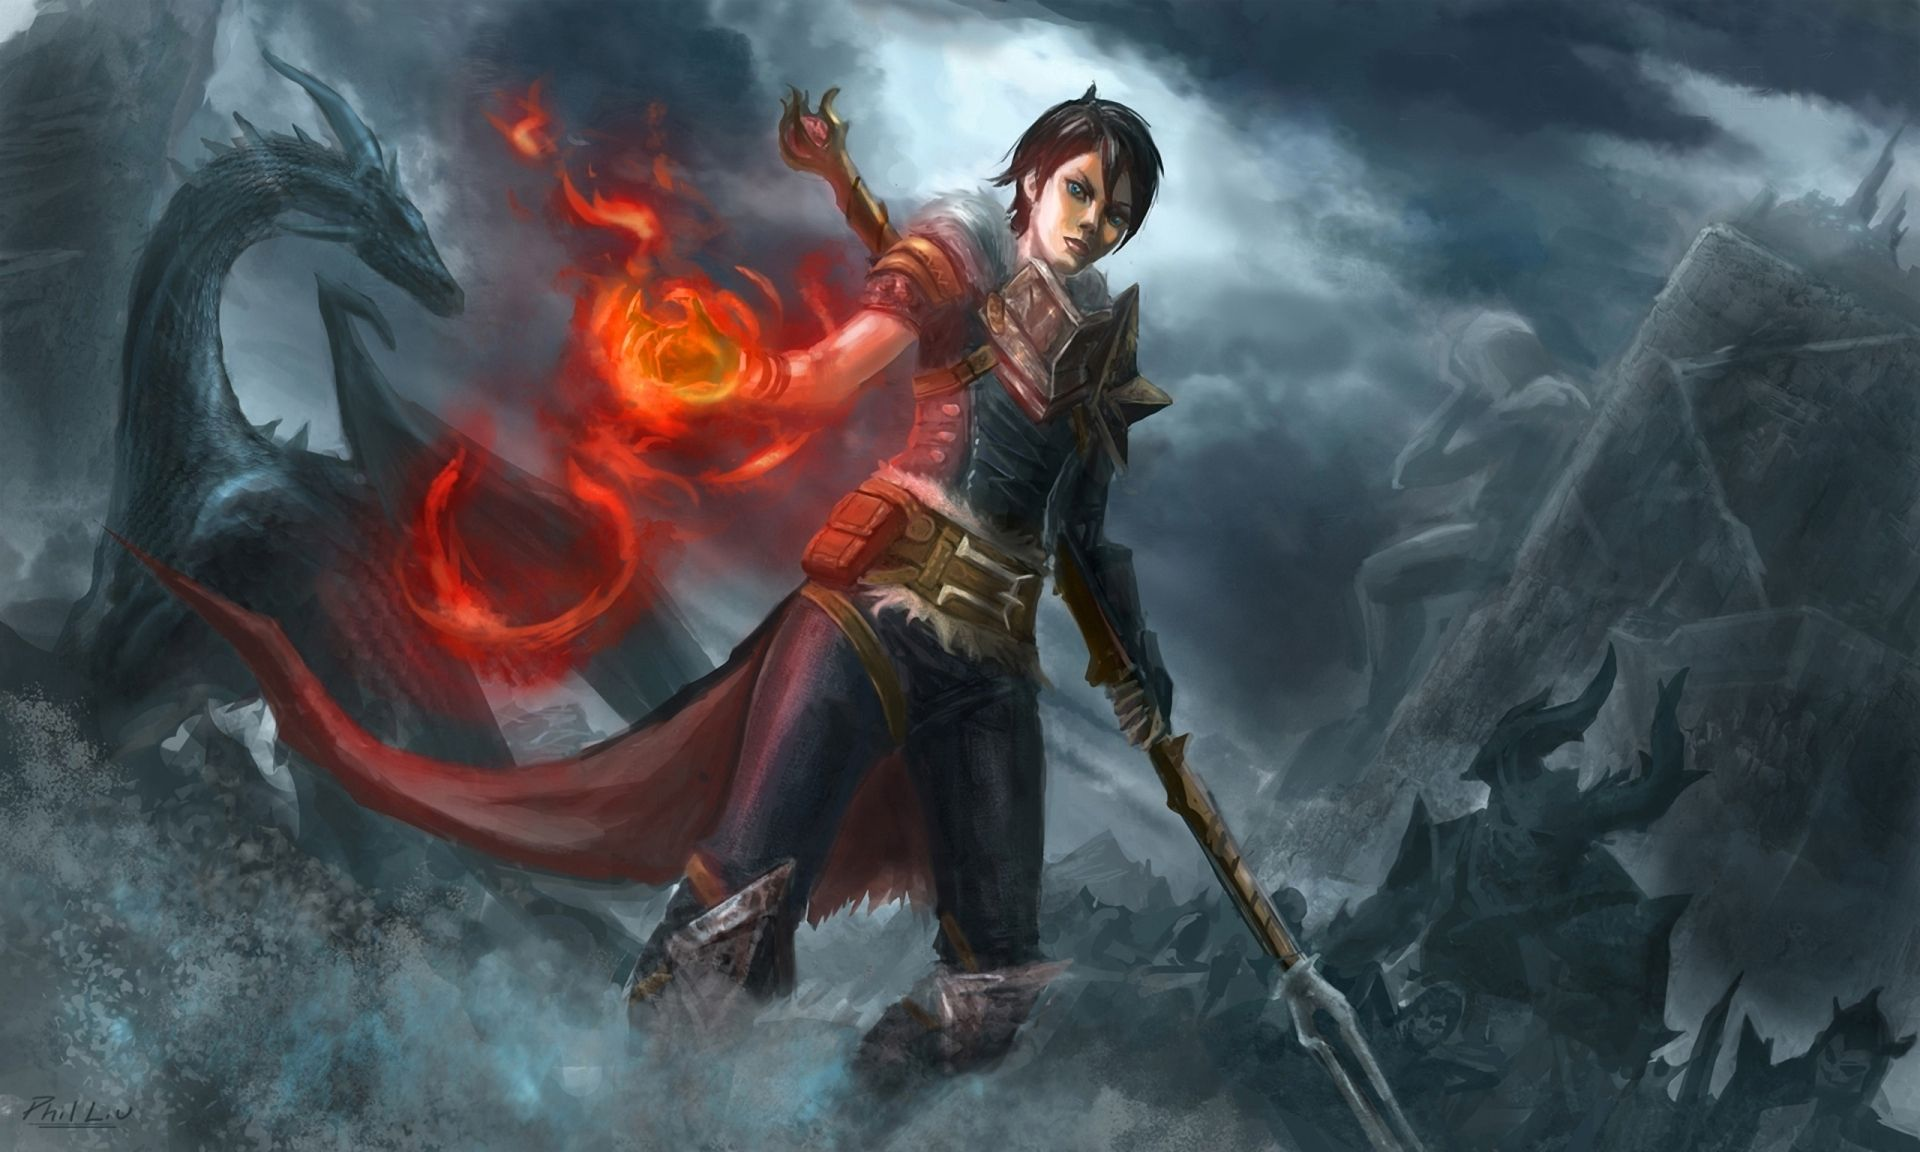 Desktop Wallpaper Of Dragon Age Image Hawk Girl Fire Mage 1920x1152